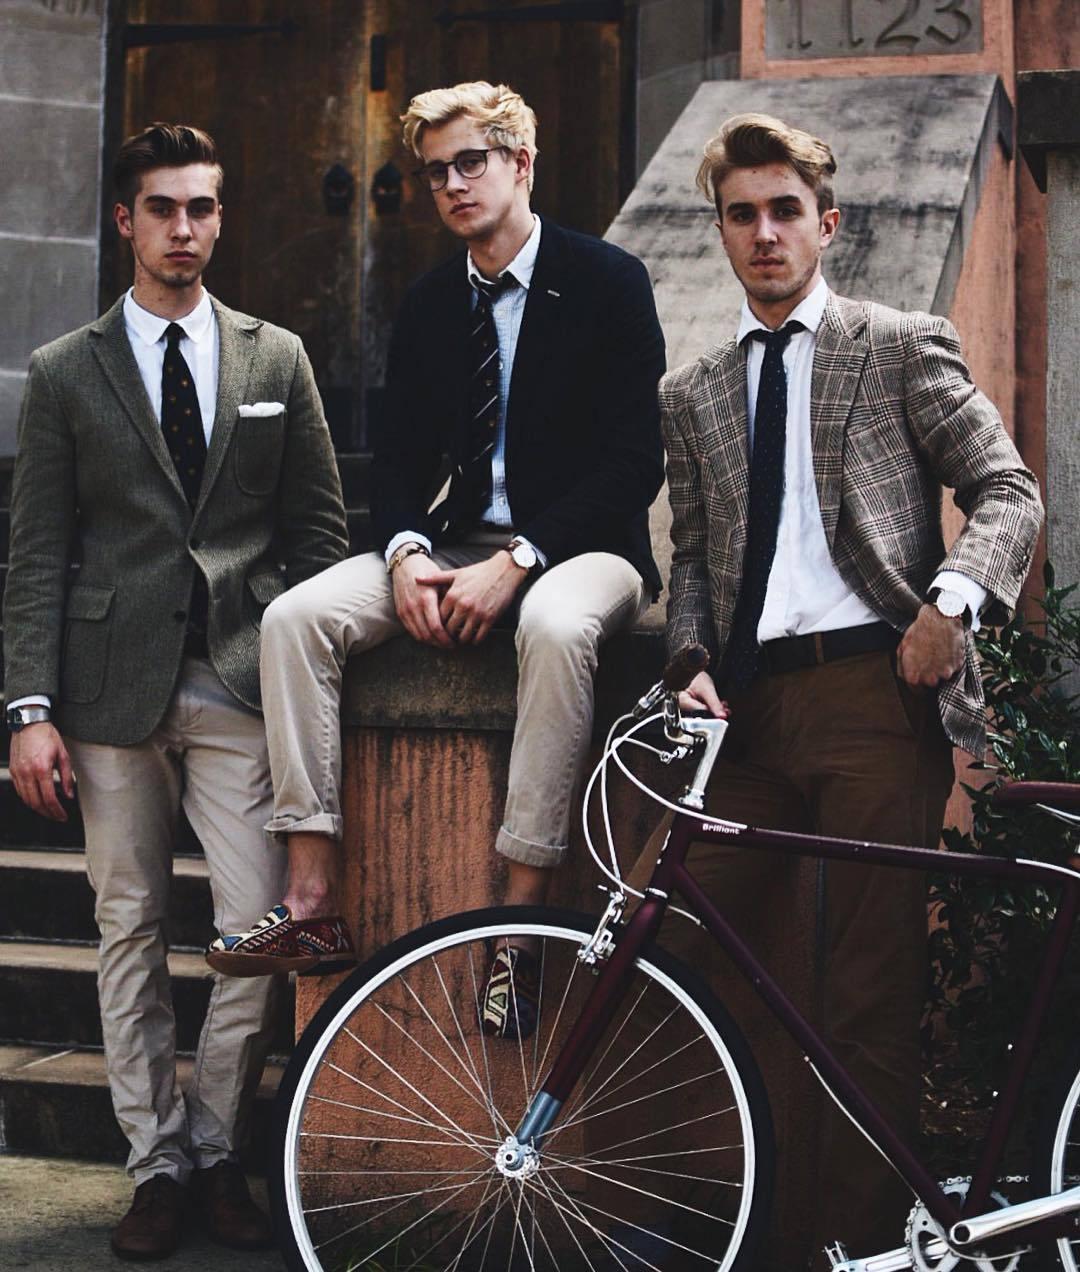 Kjp Fall Wallpaper Rue Prep Prep School Uniform Blazers I Bet You All Know